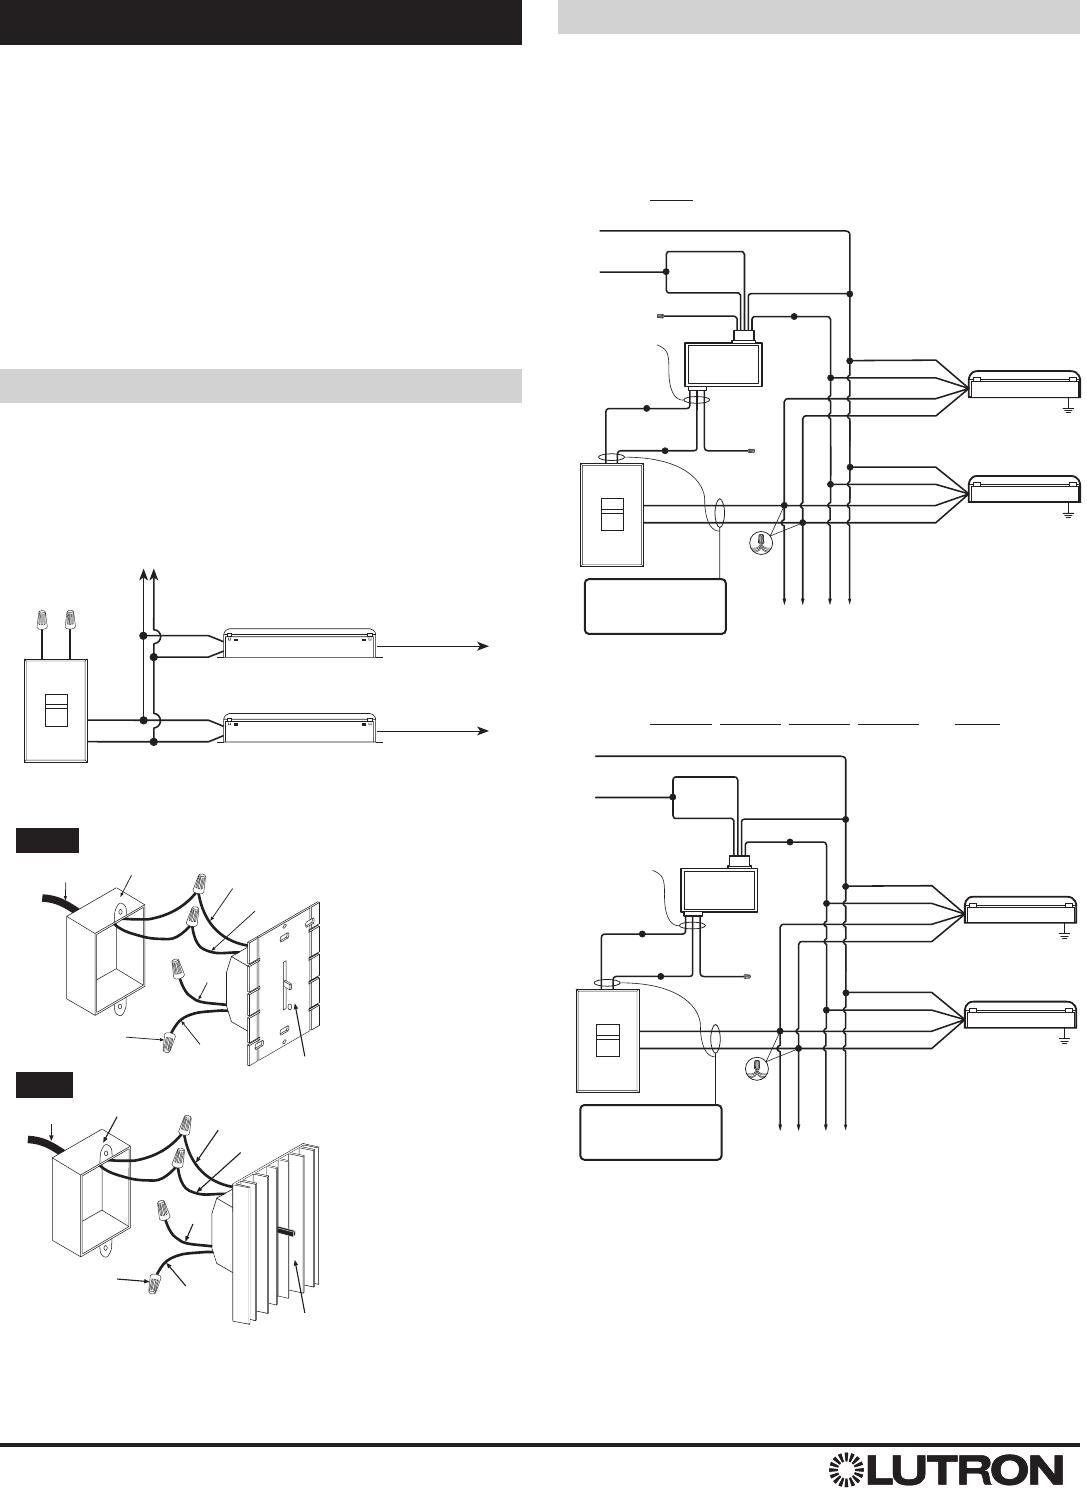 Lutron Ballast Wiring Diagram